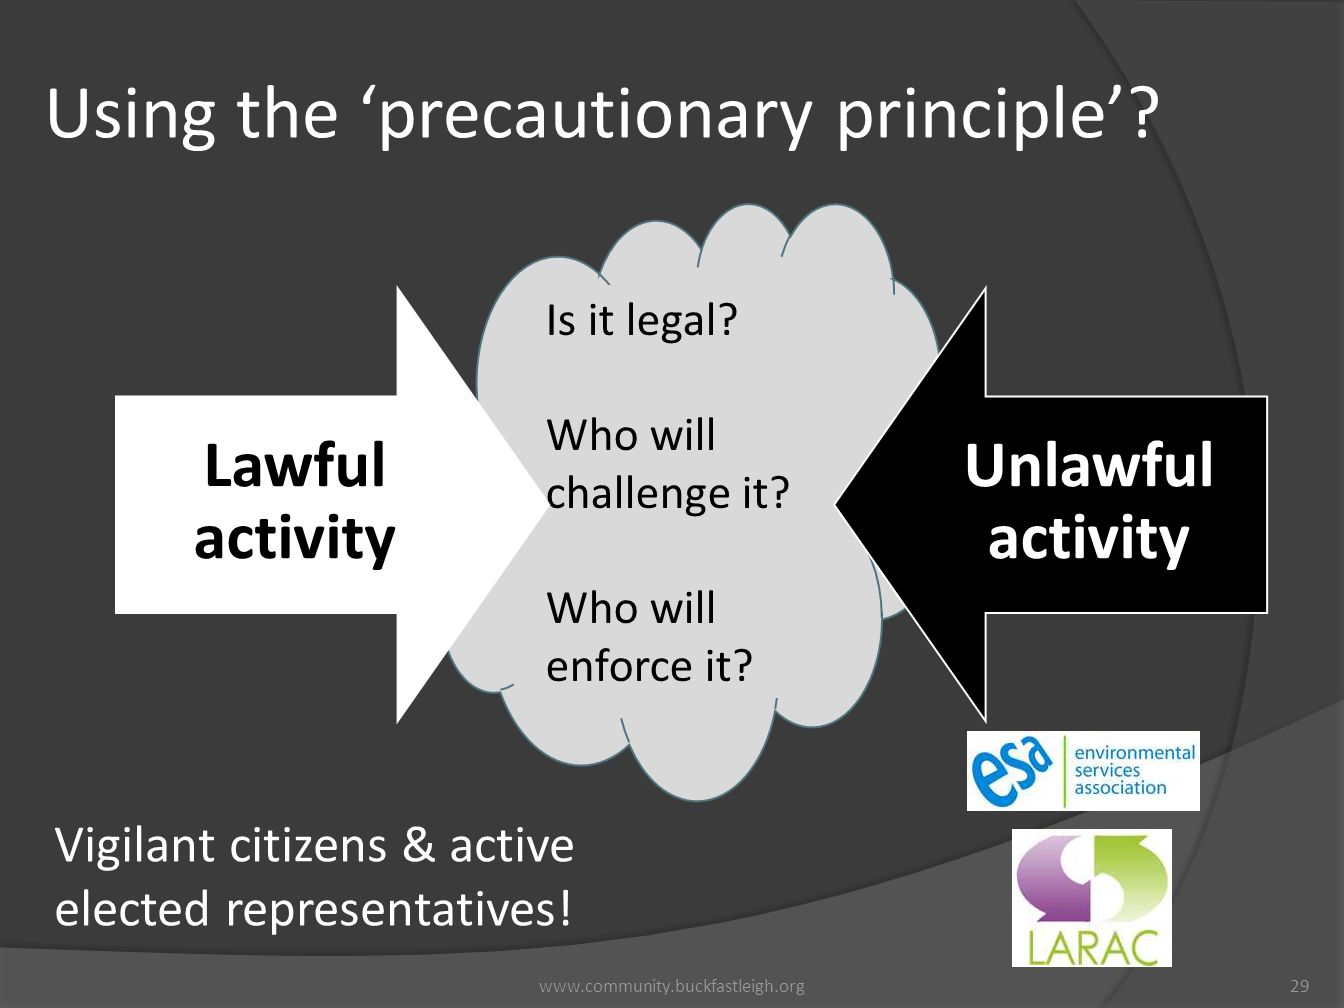 Using the 'precautionary principle'